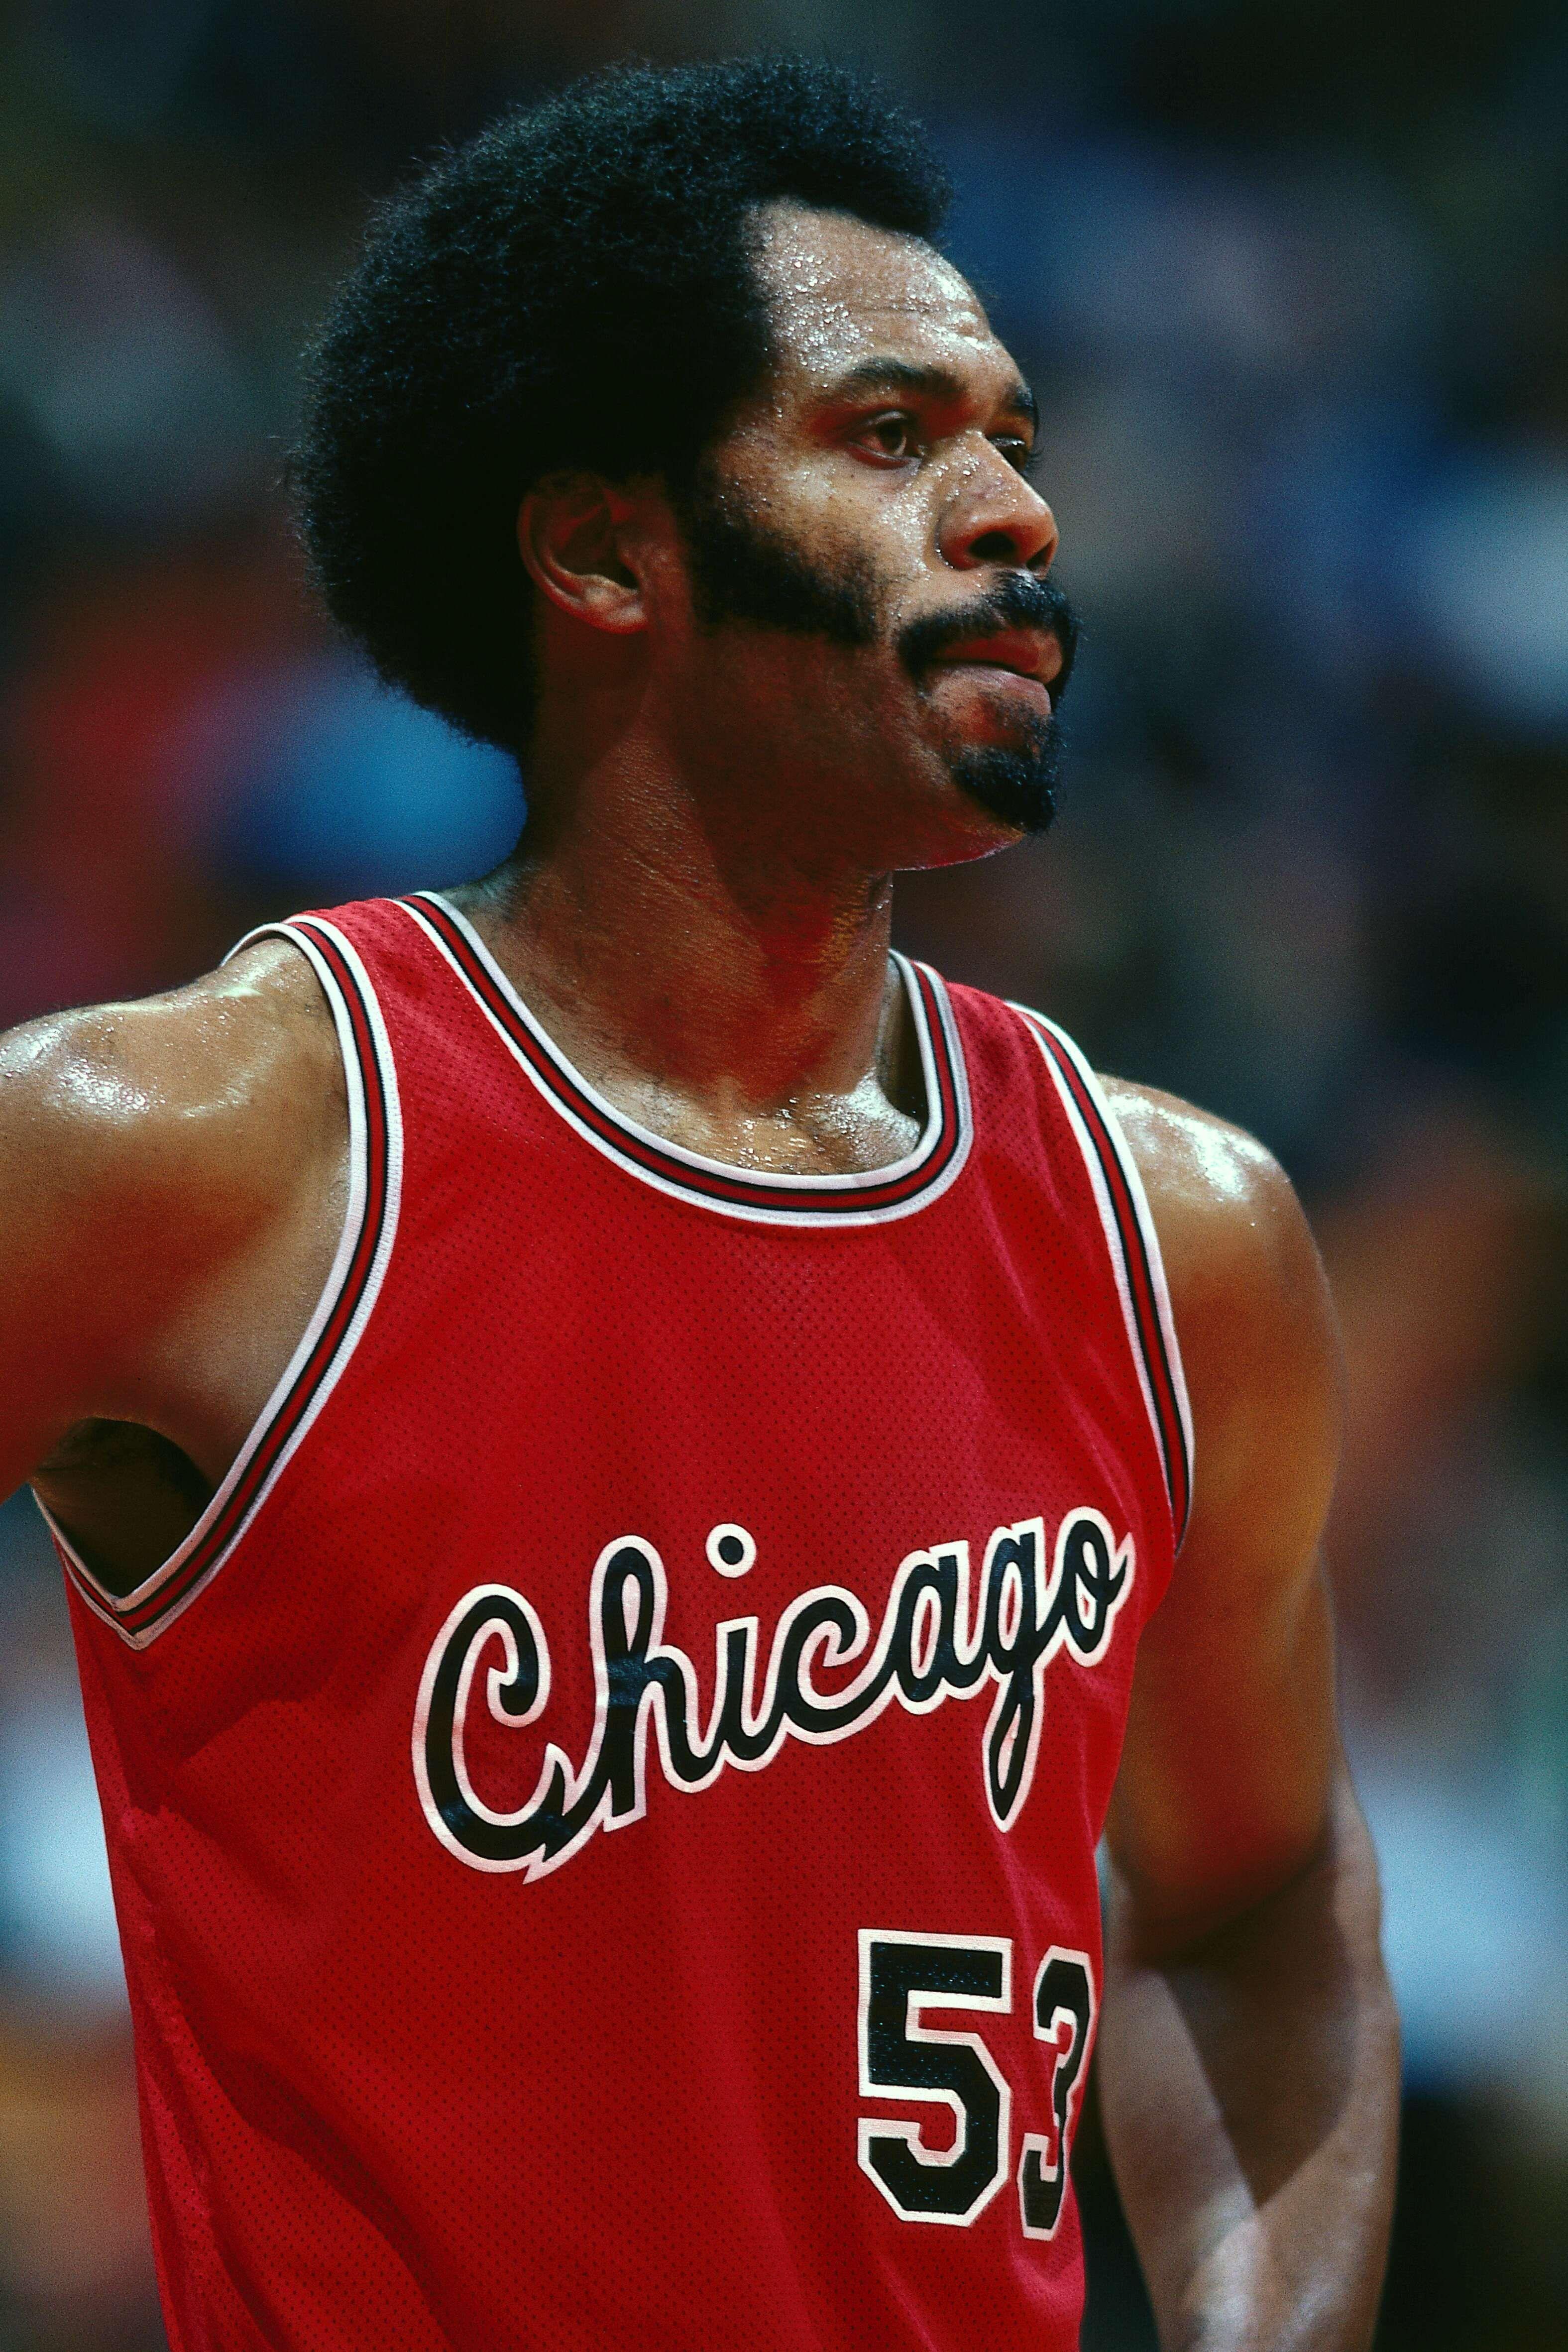 Artis Gilmore NBA Legends Pinterest